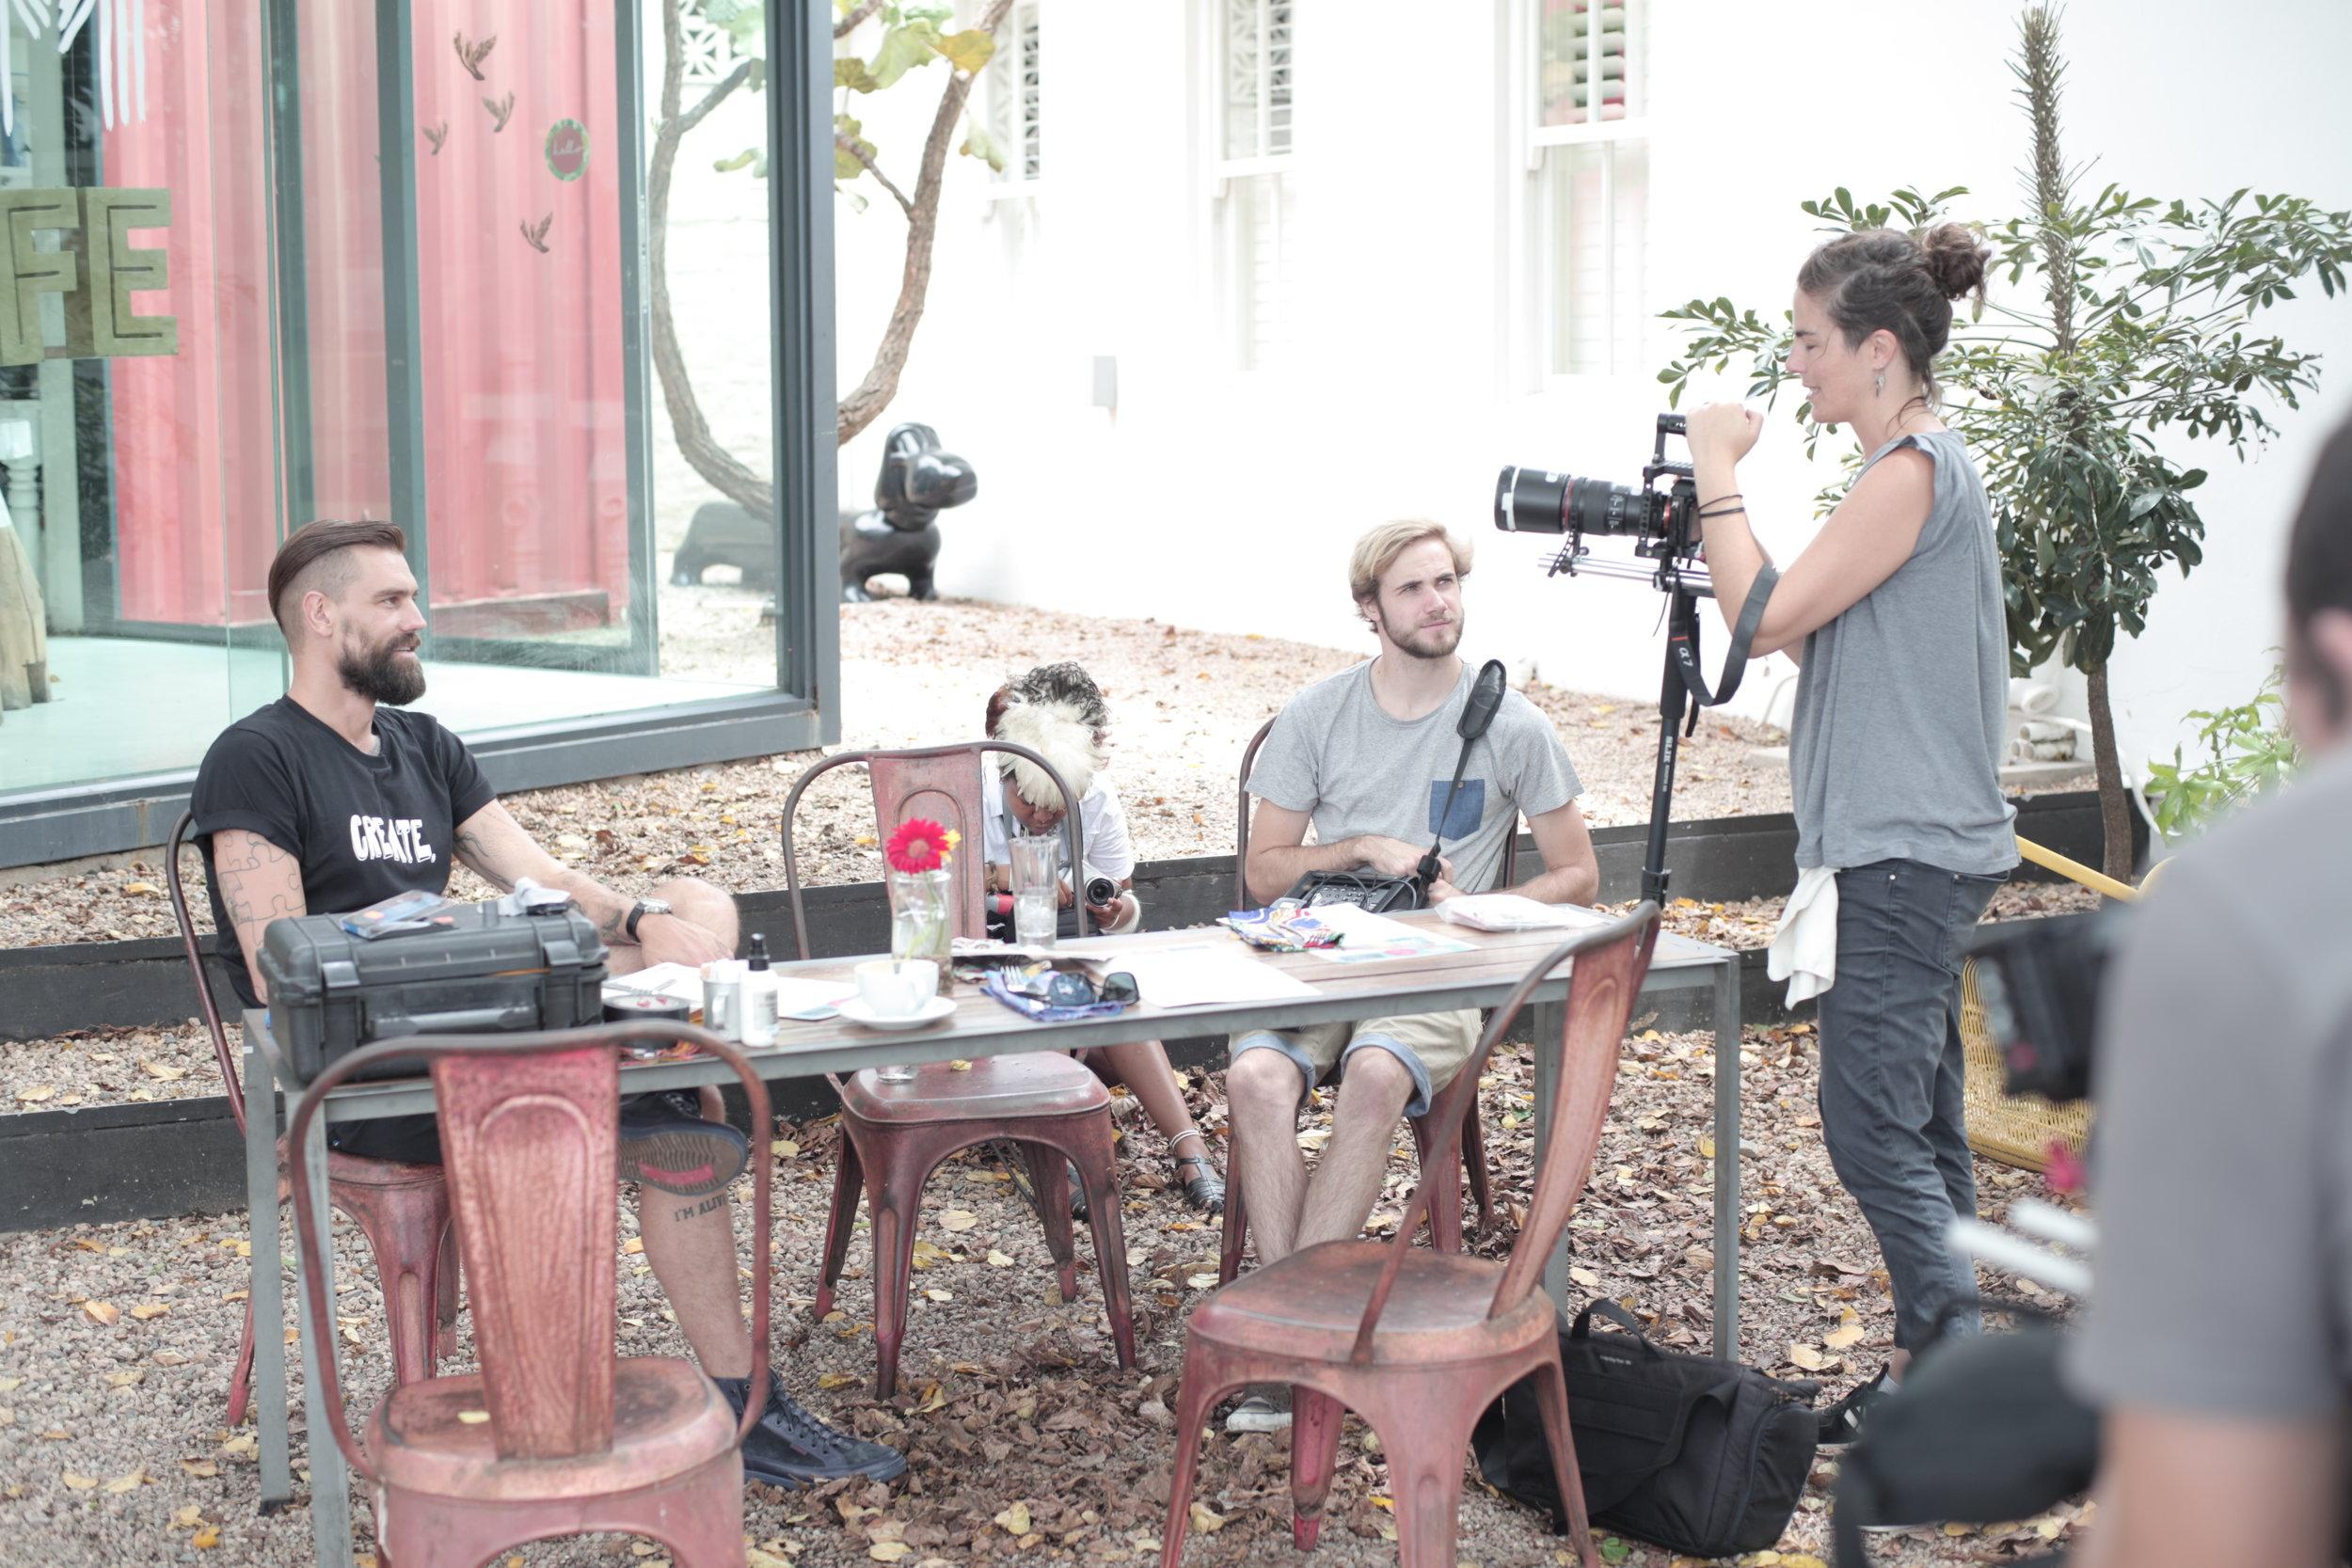 Brett Rogers_Food Booze and Tattoos_Season 1_Behind the Scenes (4).JPG